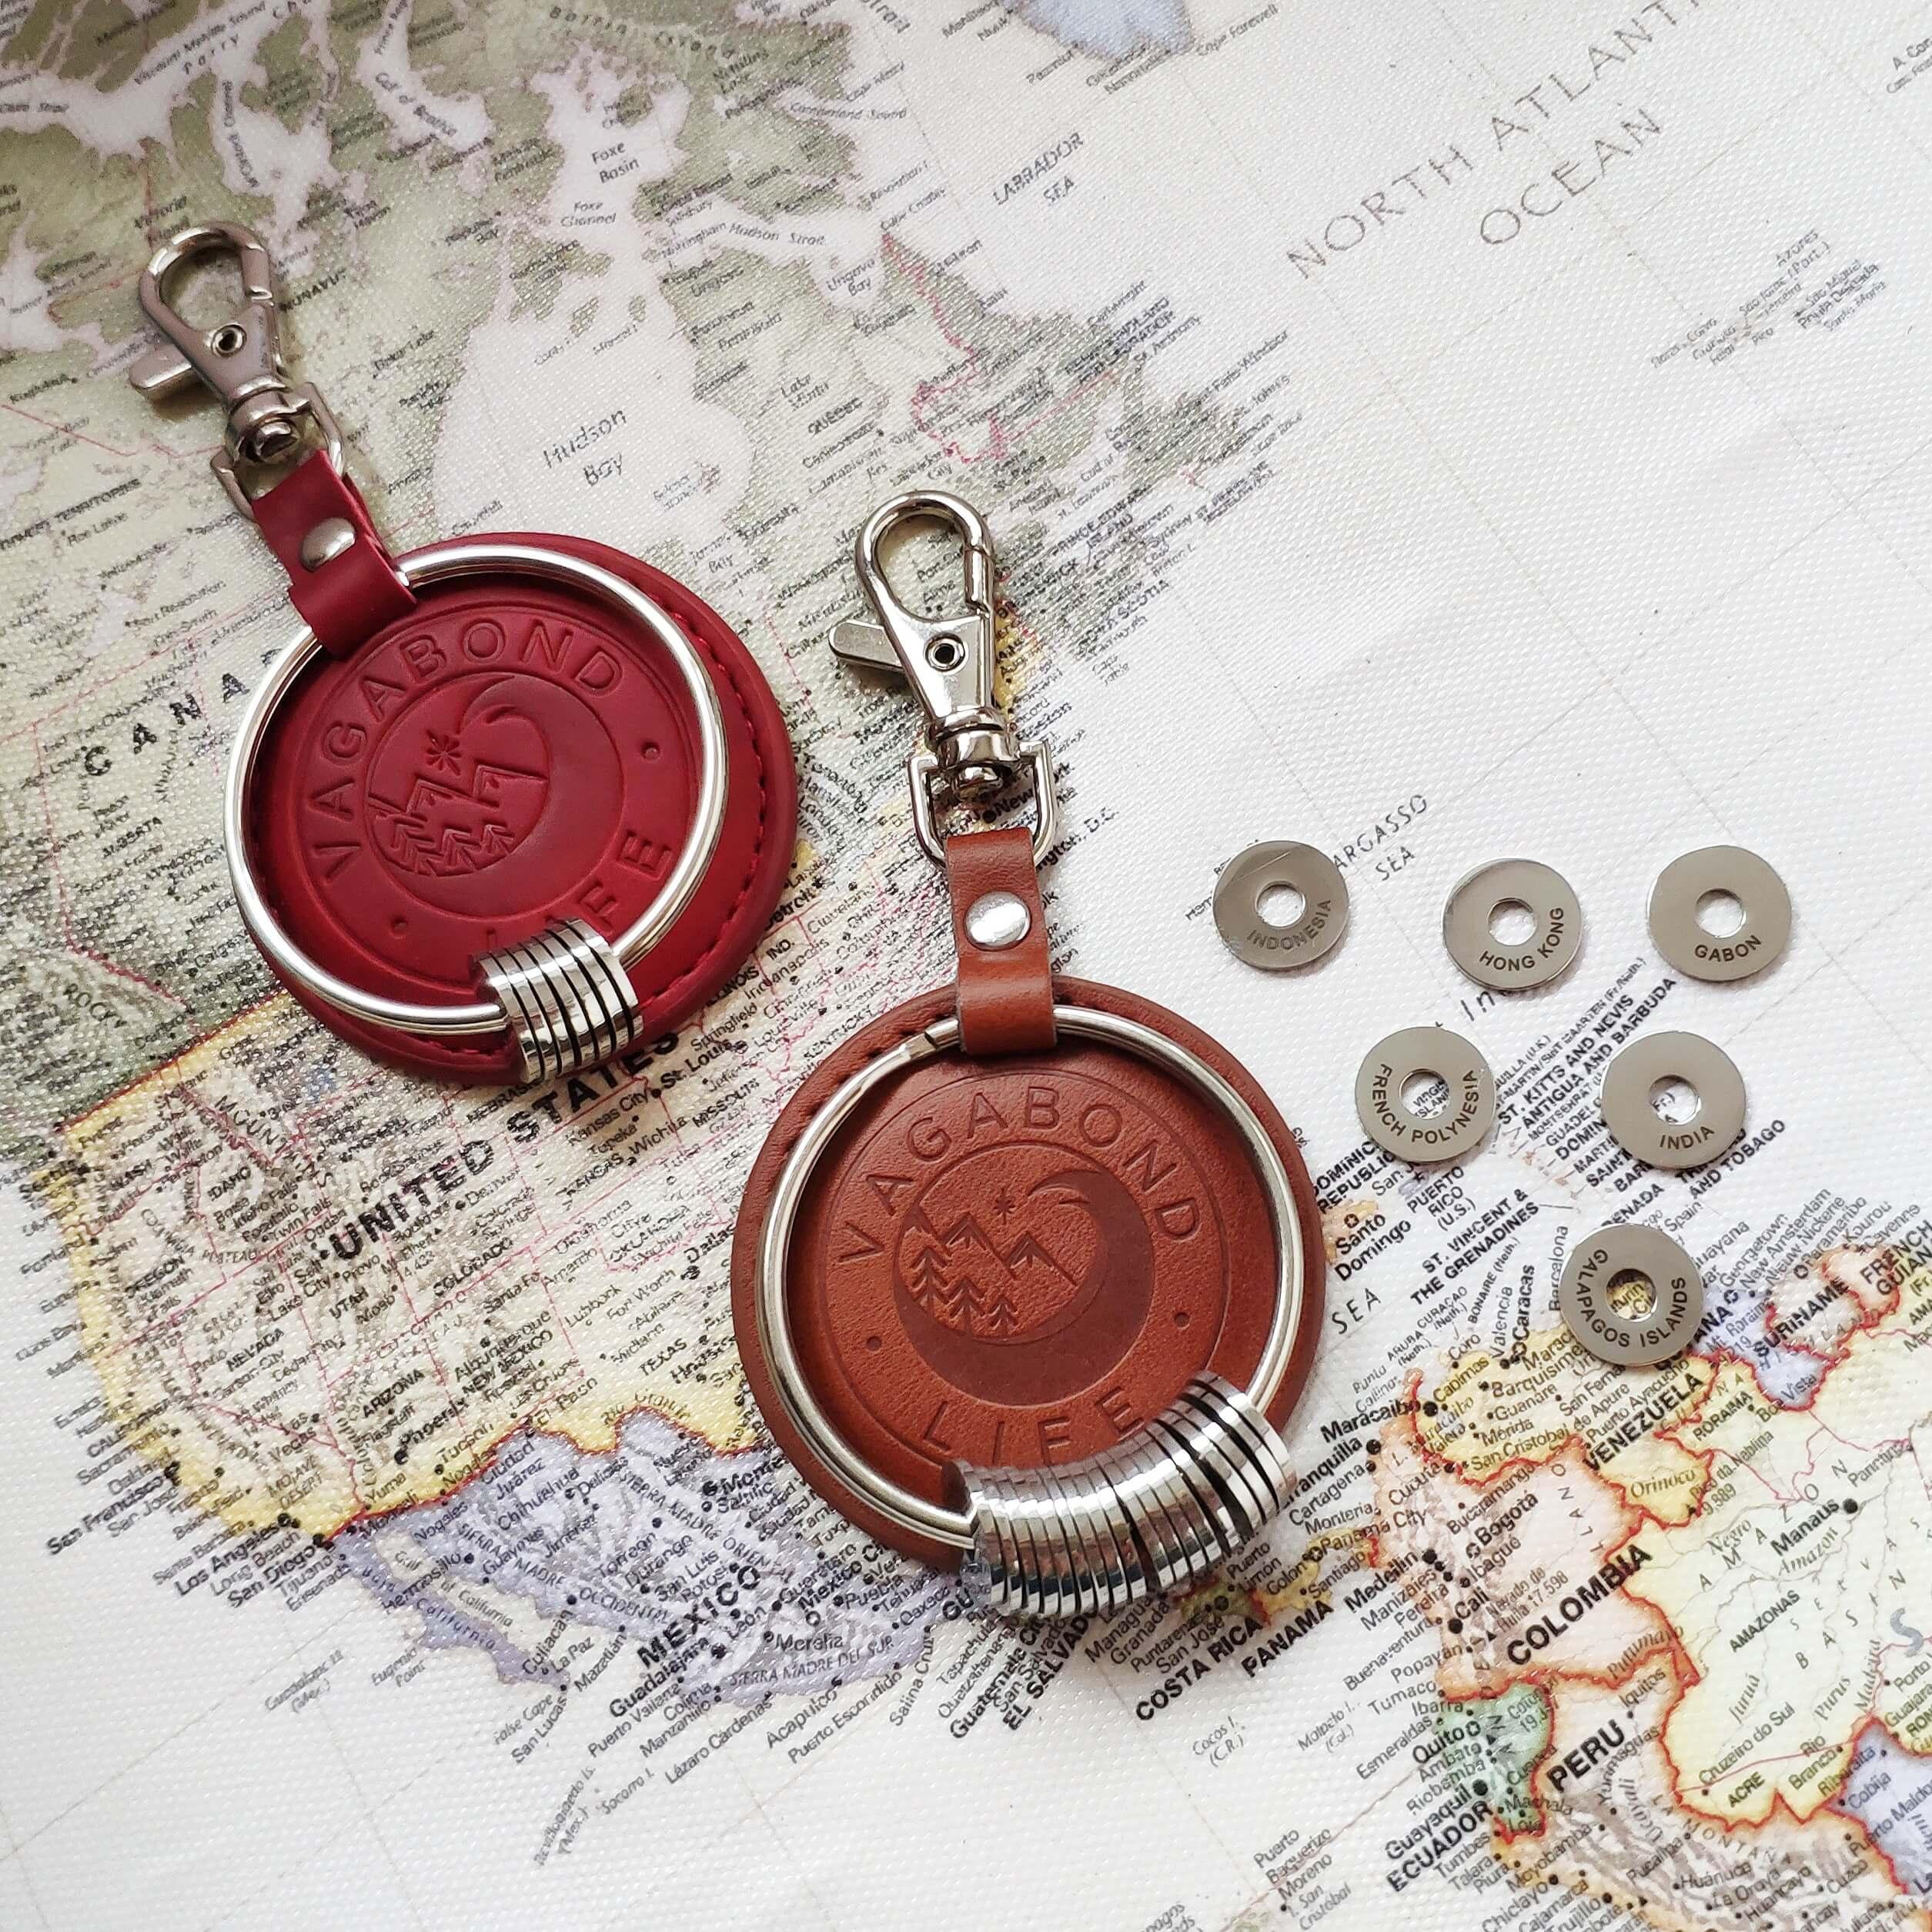 Keychain  on world map background